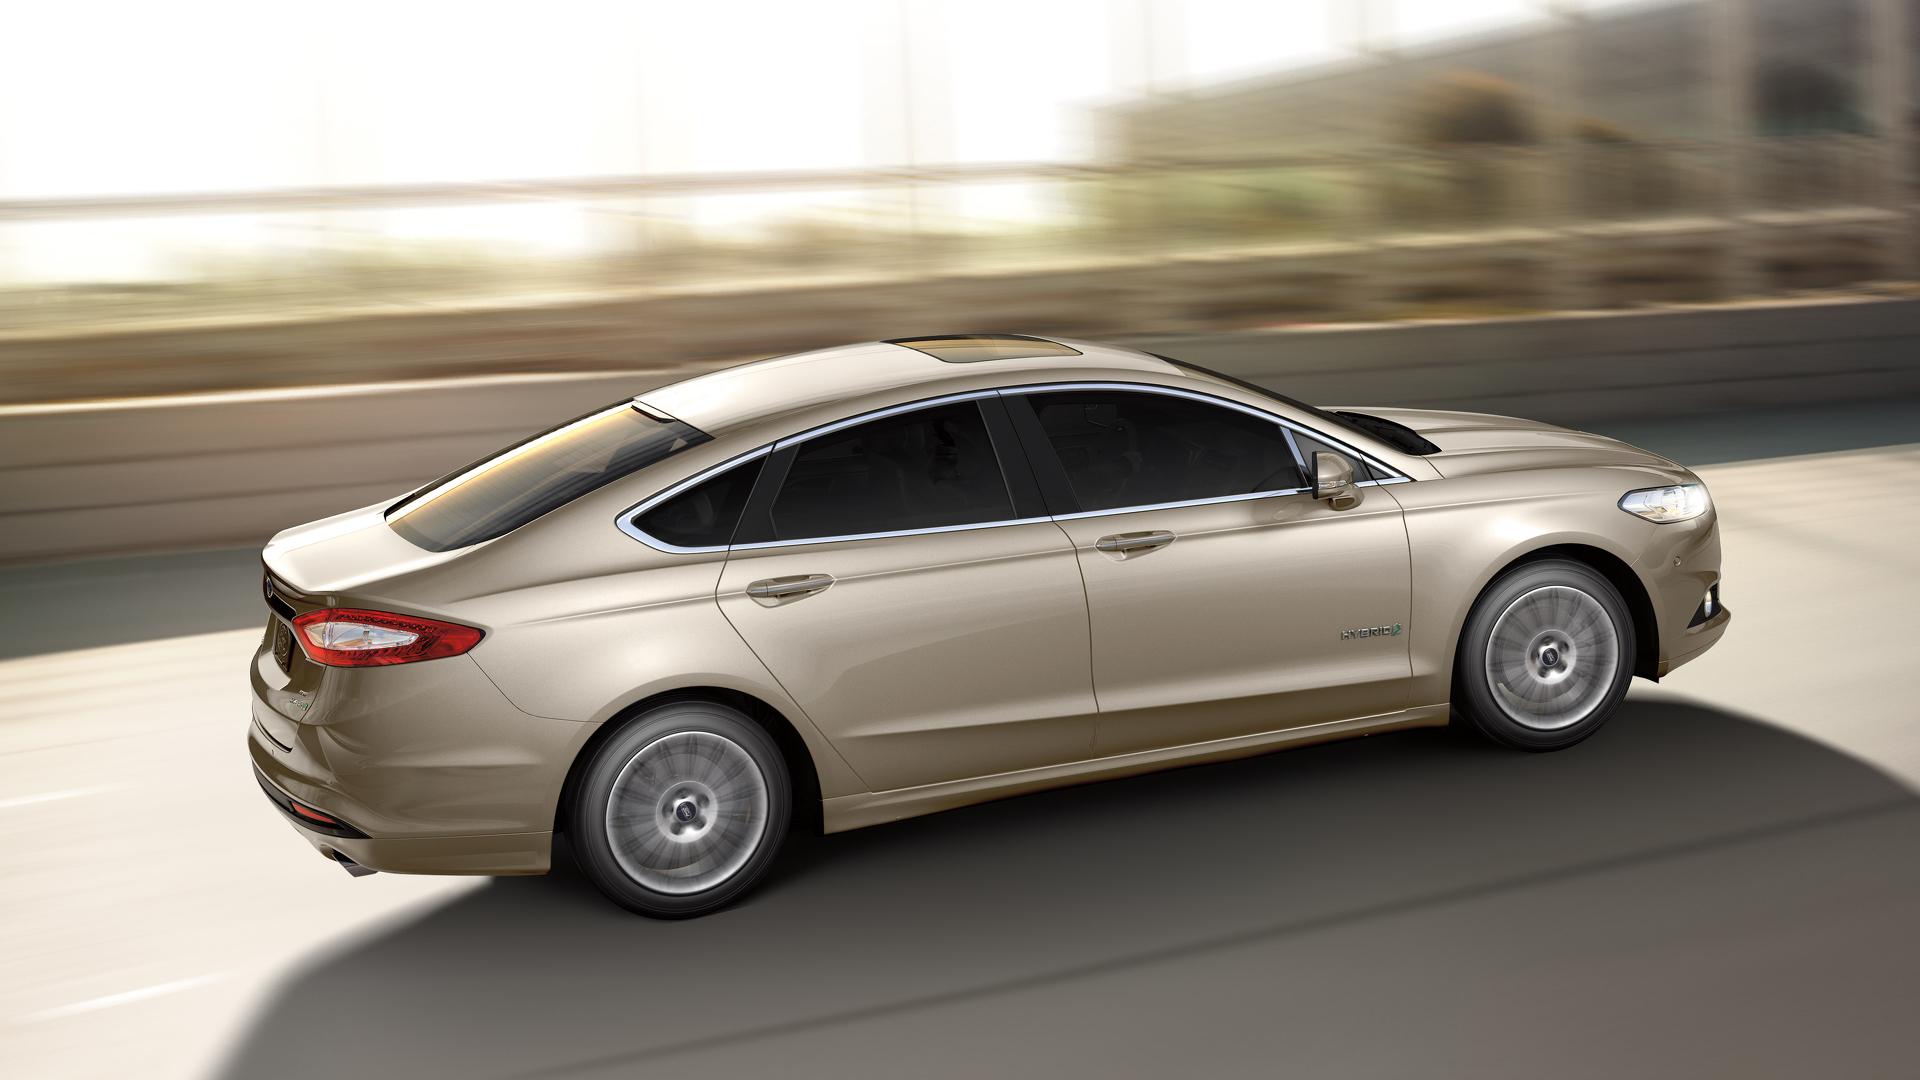 Ford Fusion Hybrid News And Reviews Motor1 Com